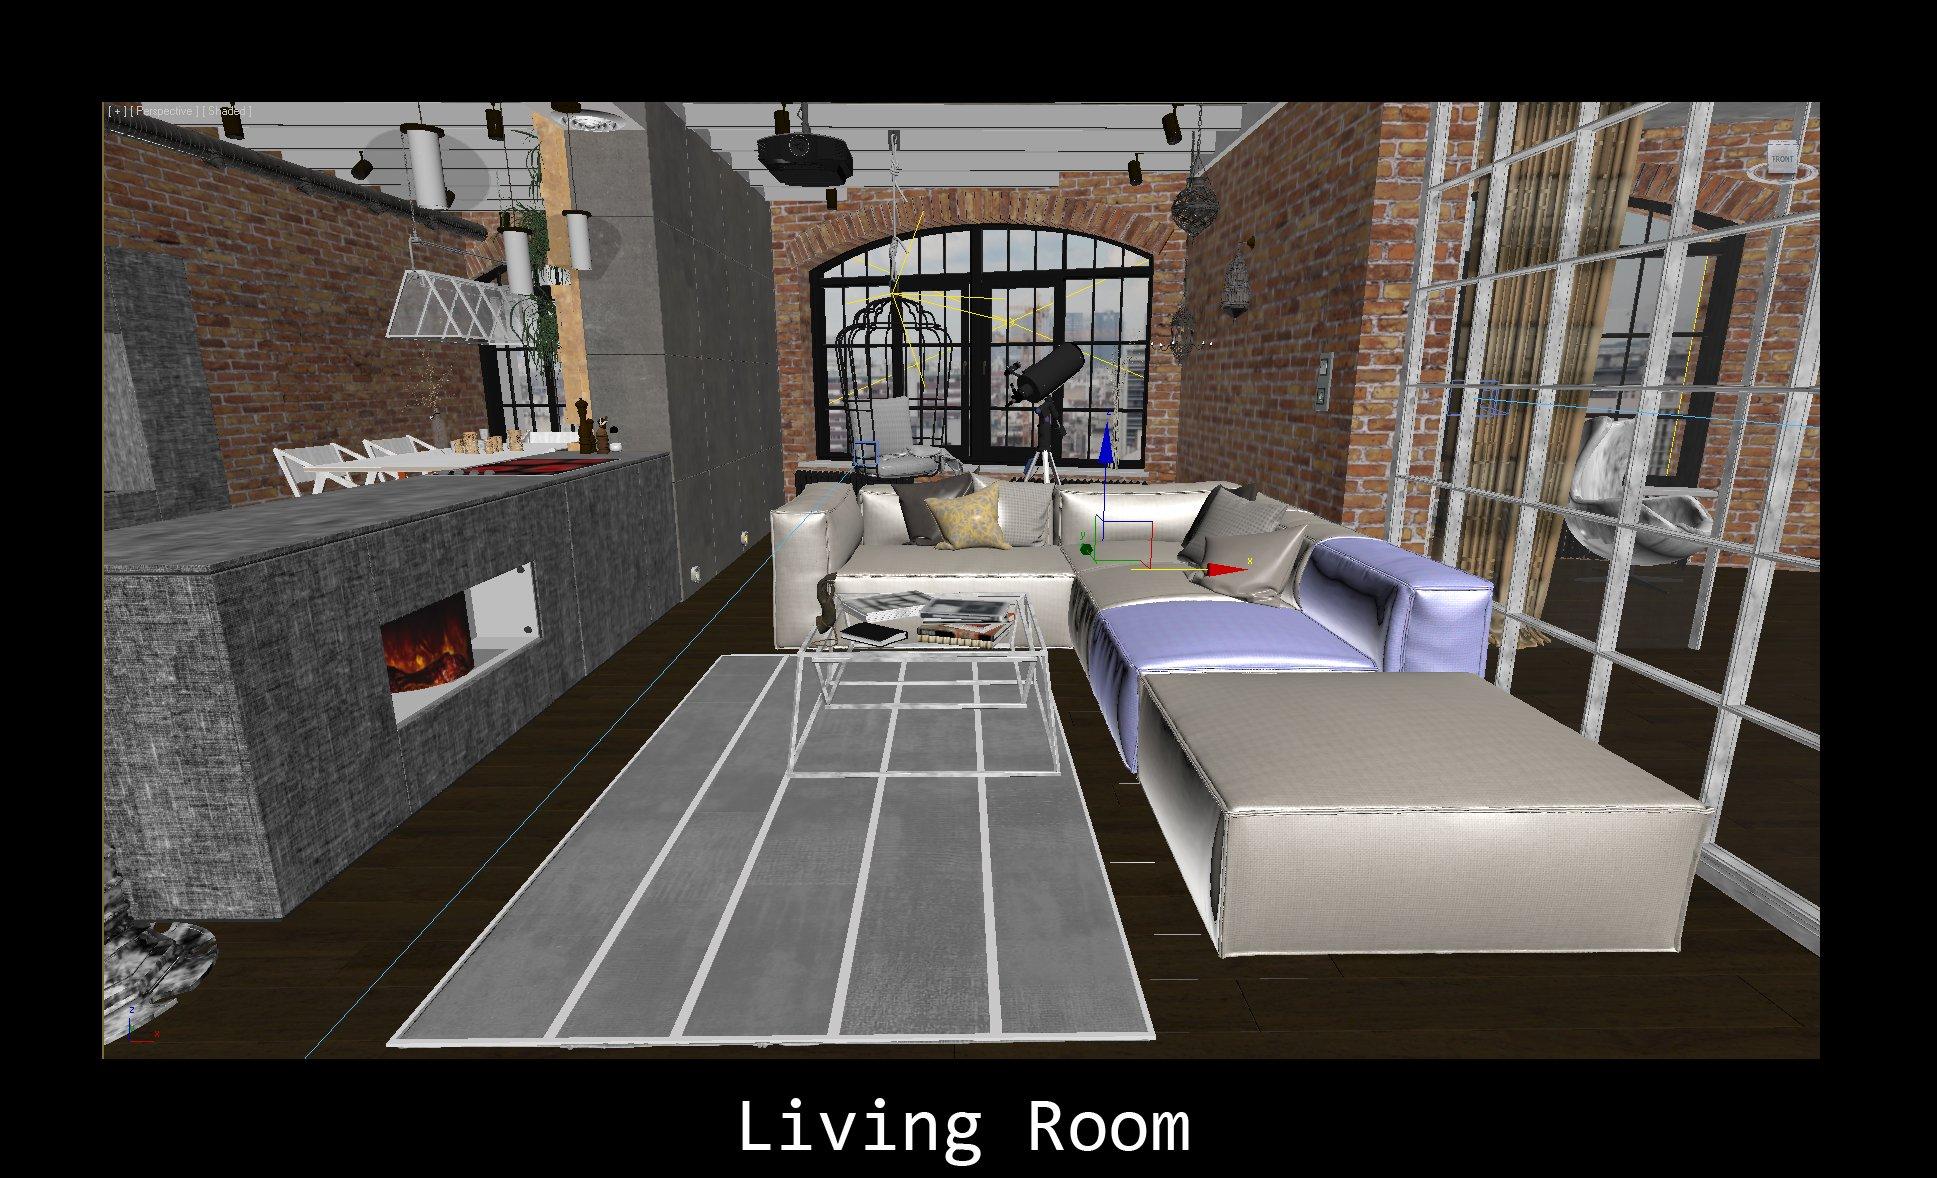 0006_001_Living_Room_NR_02828.jpg